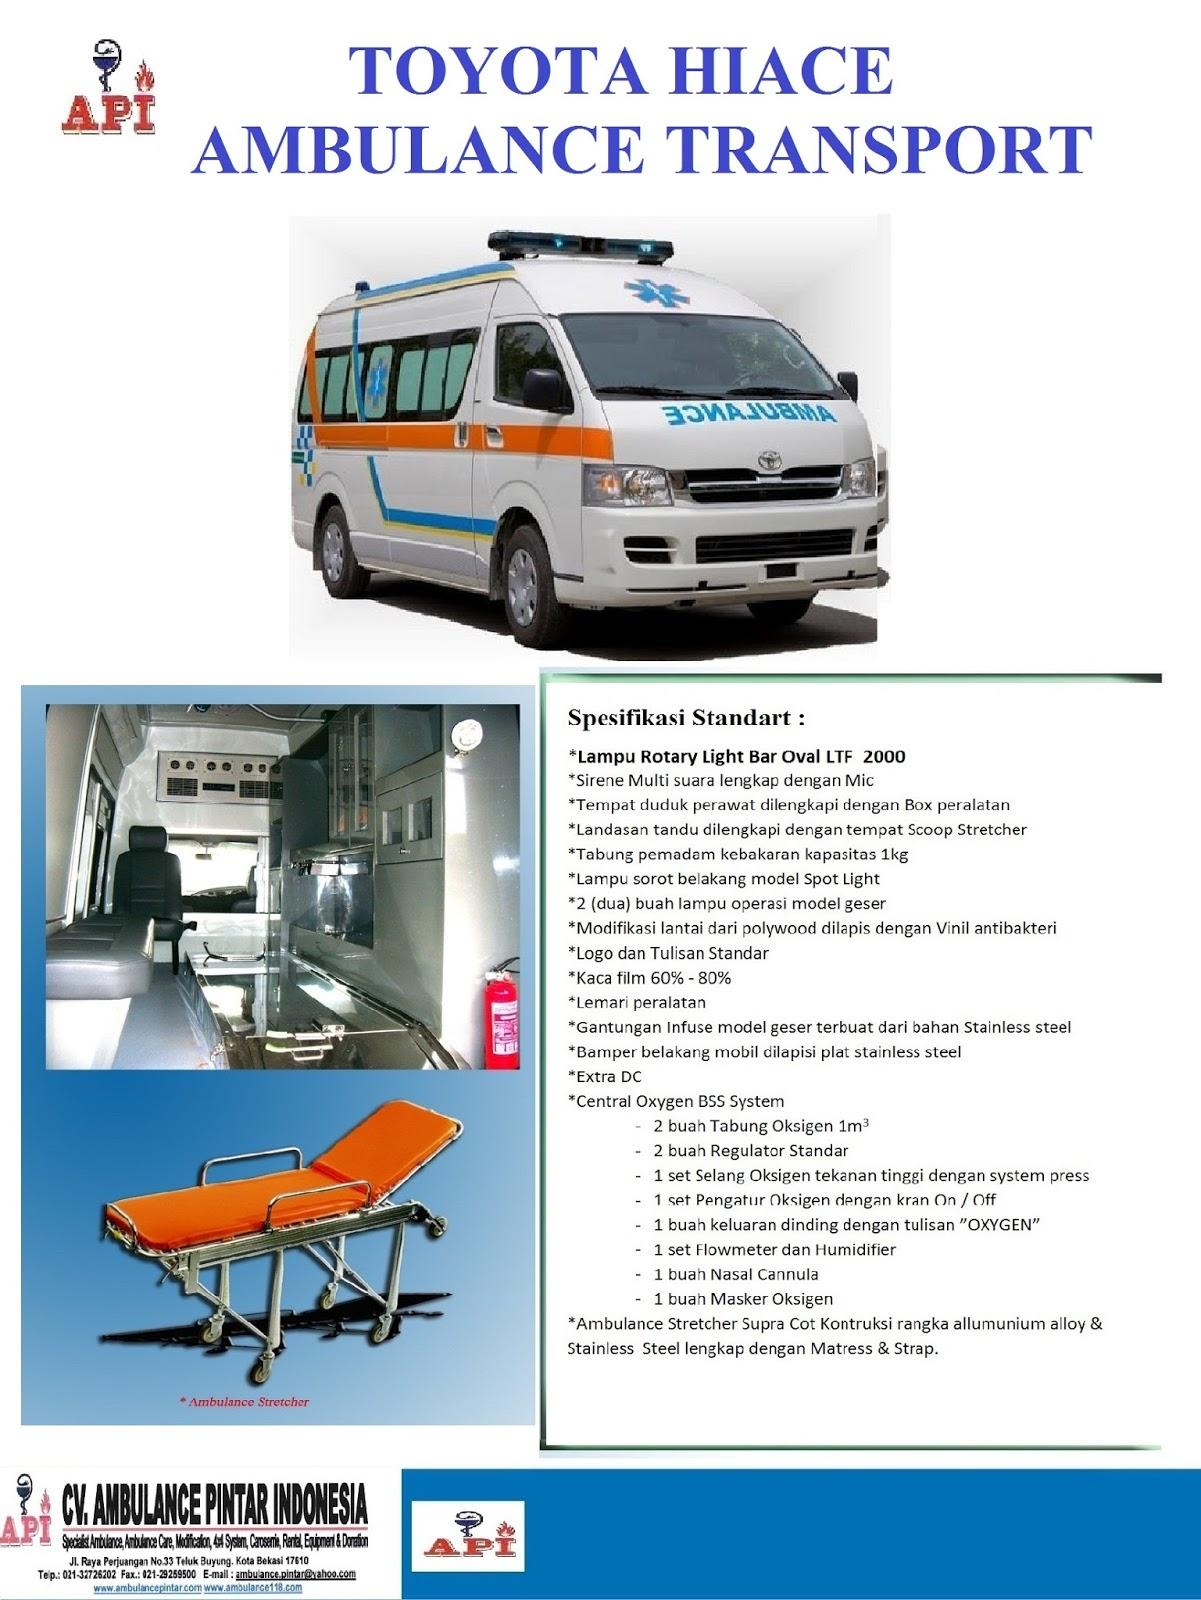 Ambulance Toyota Hiace Commuter MENJUAL DAN MENYEWAKAN MOBIL AMBULANCE